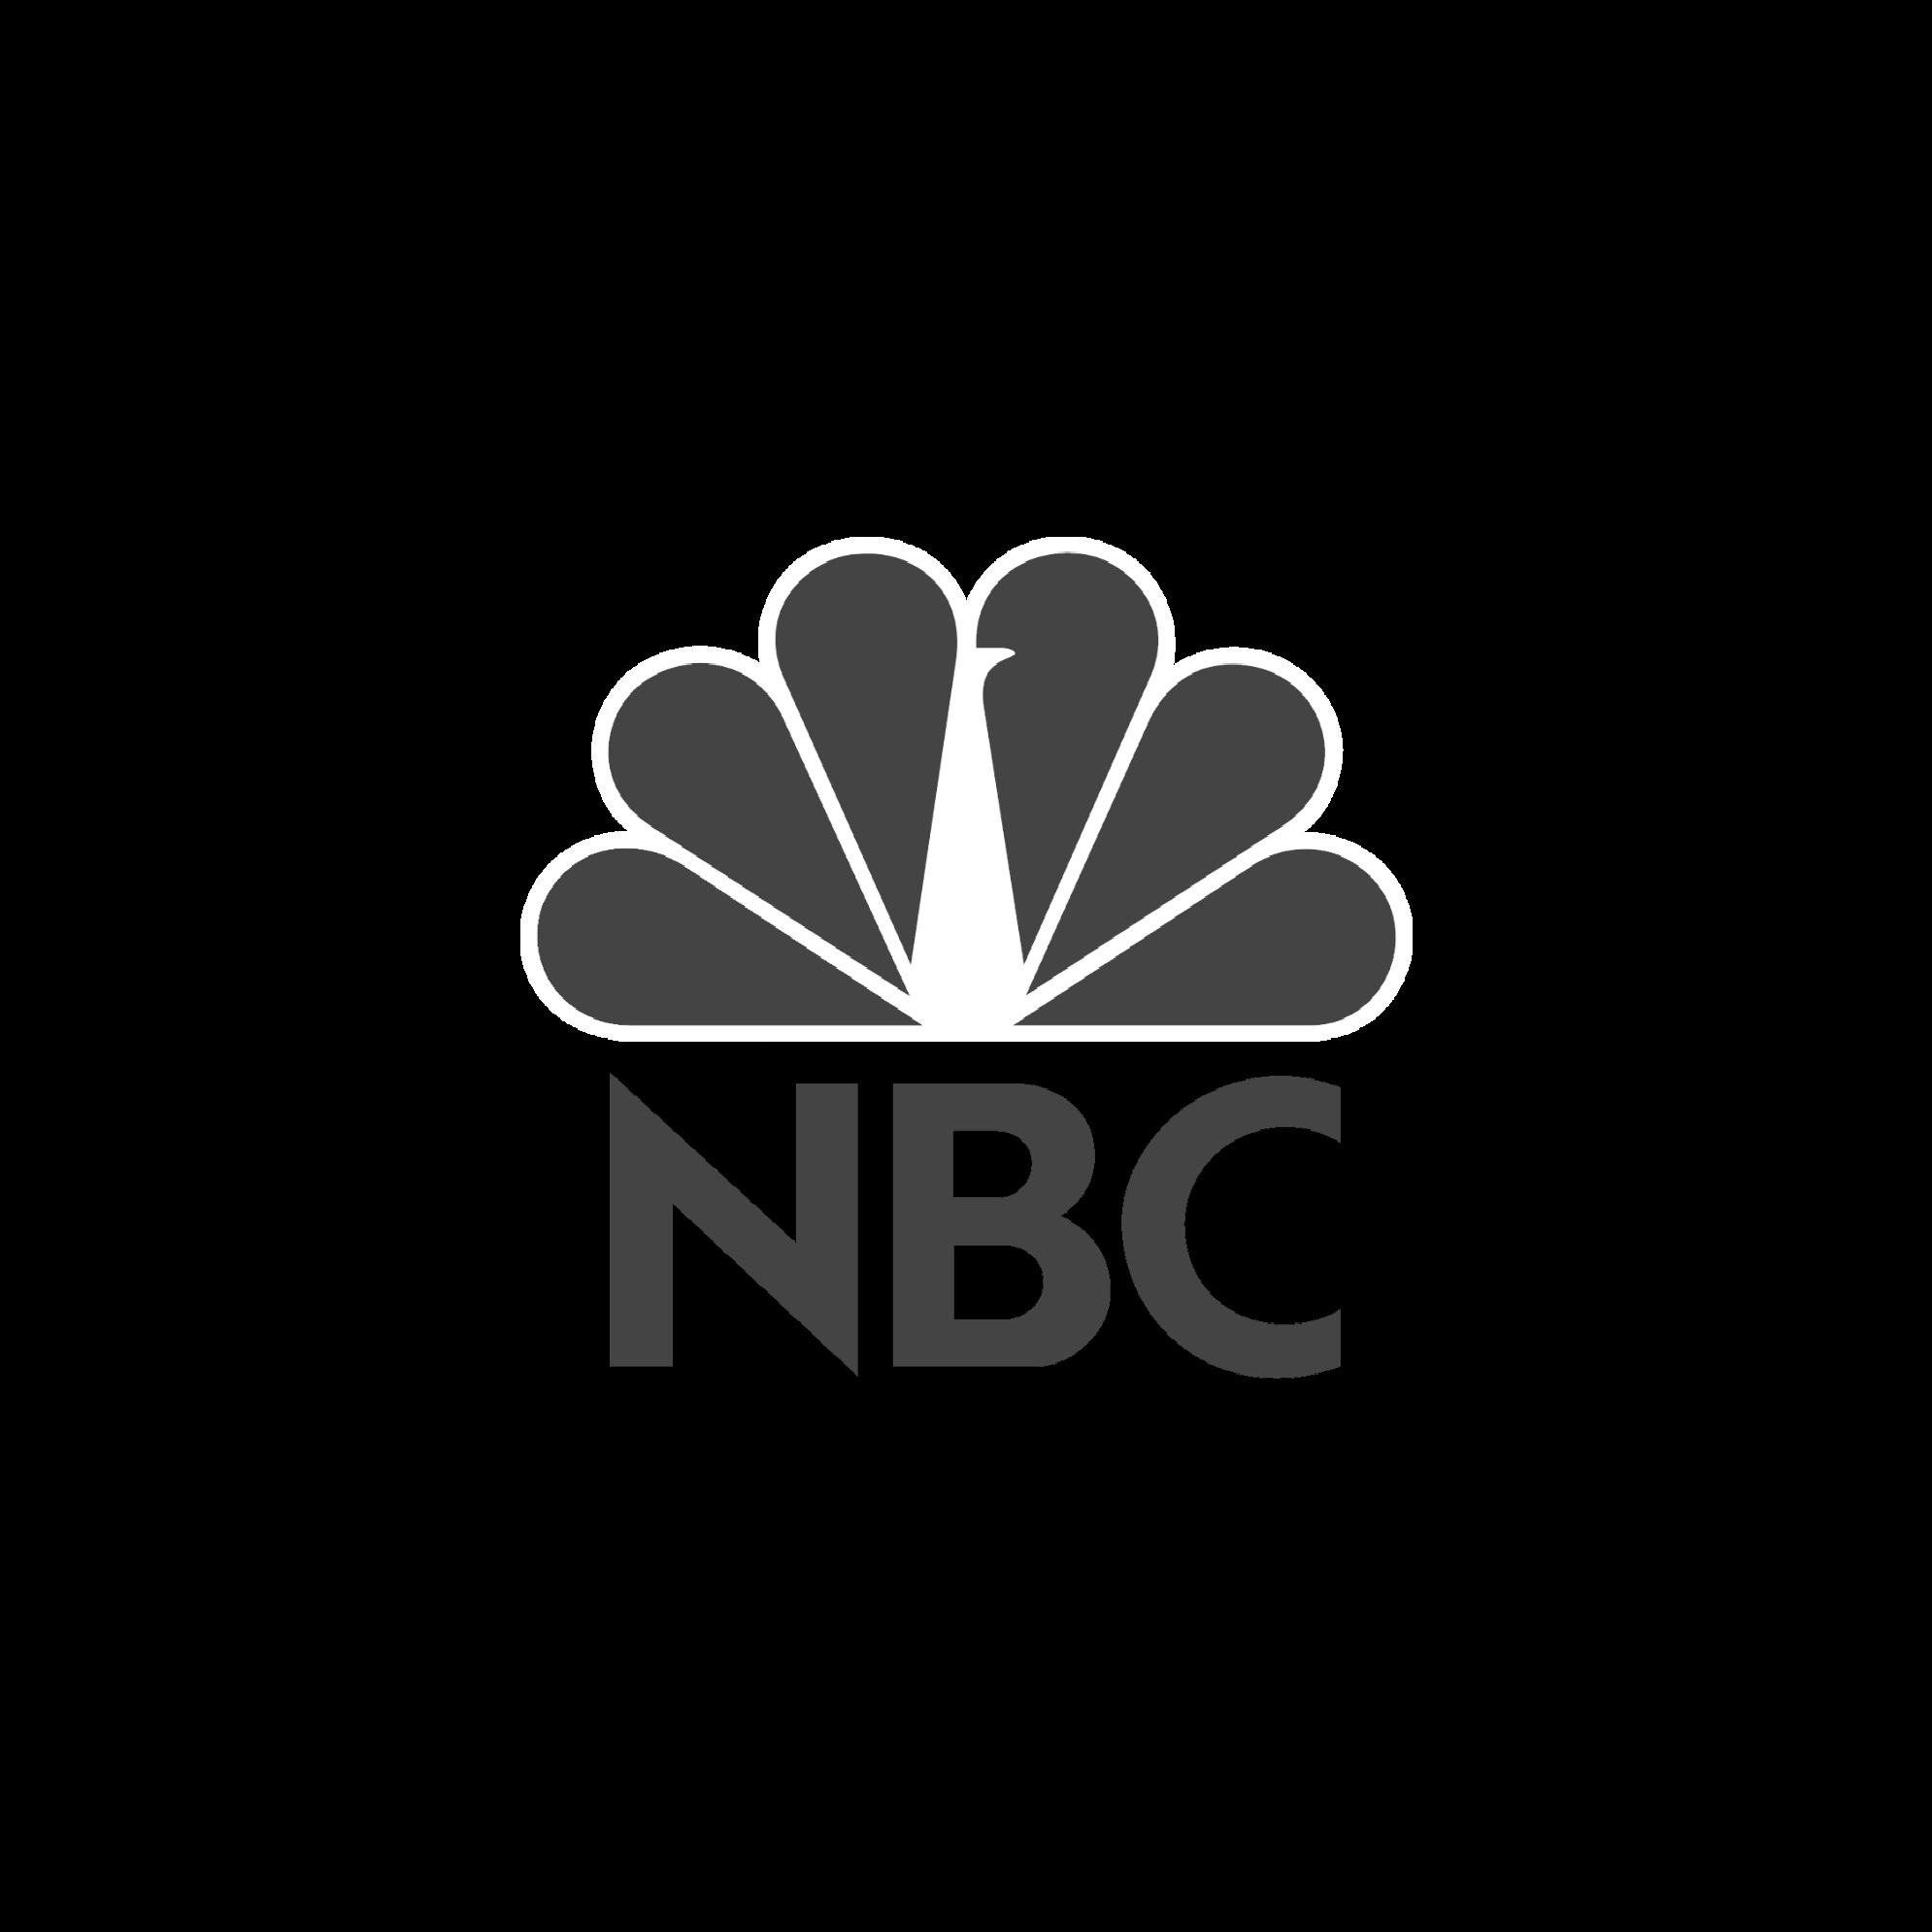 1039px-NBC_logo-1